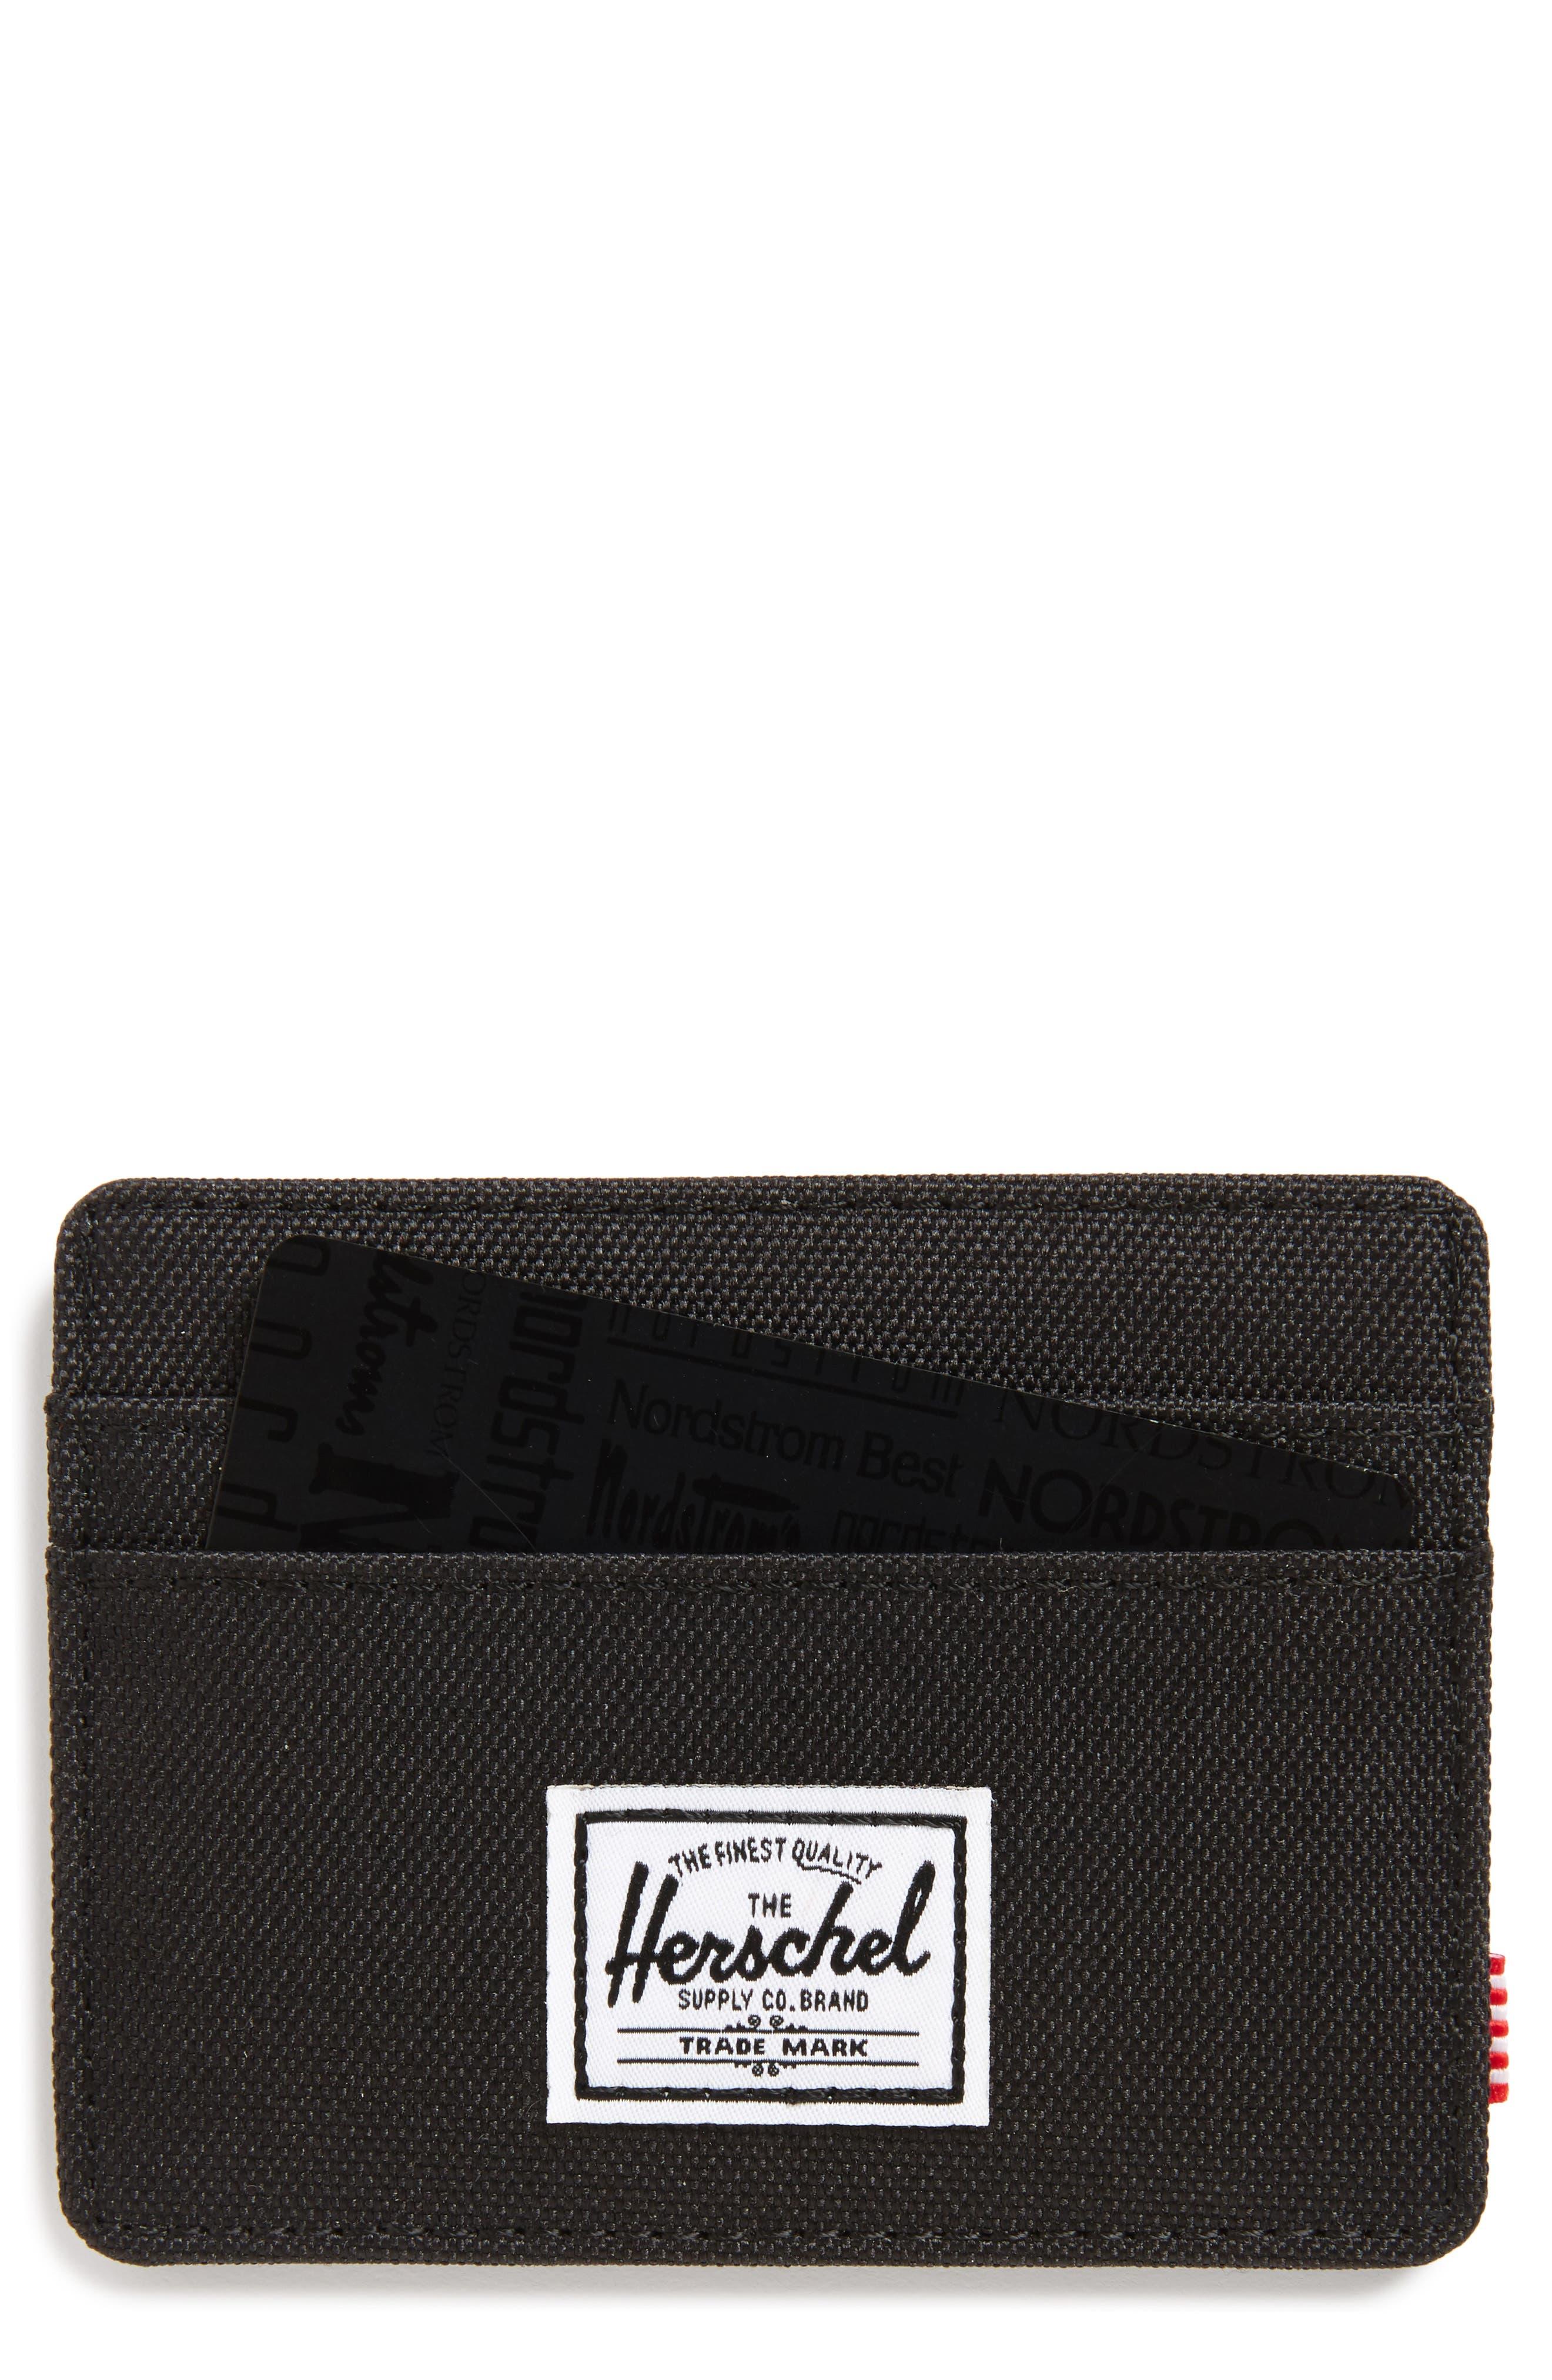 Charlie RFID Card Case,                             Main thumbnail 1, color,                             Black